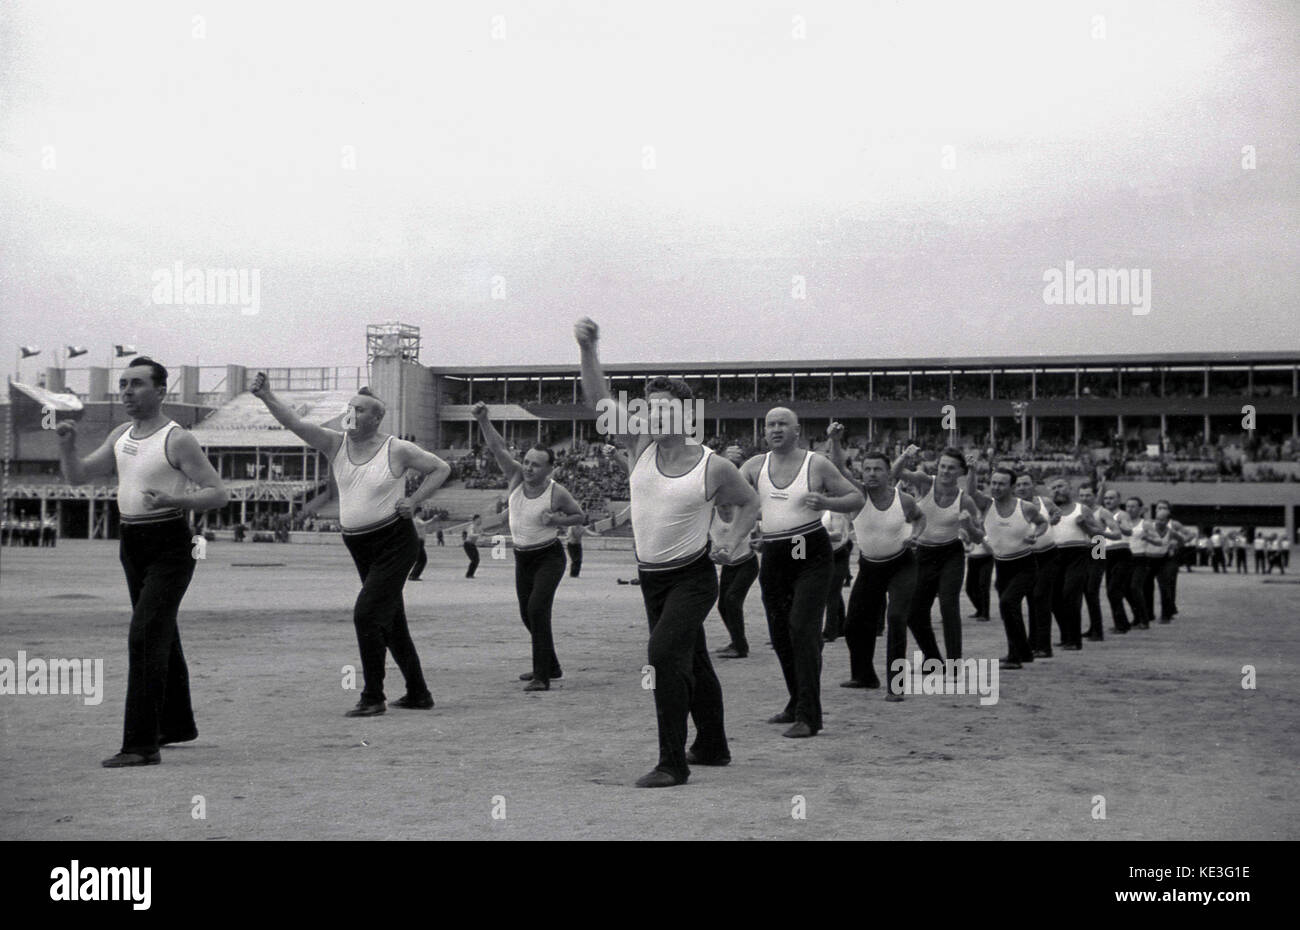 1938. historical, sport, male participants at the massive Strahov Stadium, Prague, Czechoslovakia taking part in - Stock Image